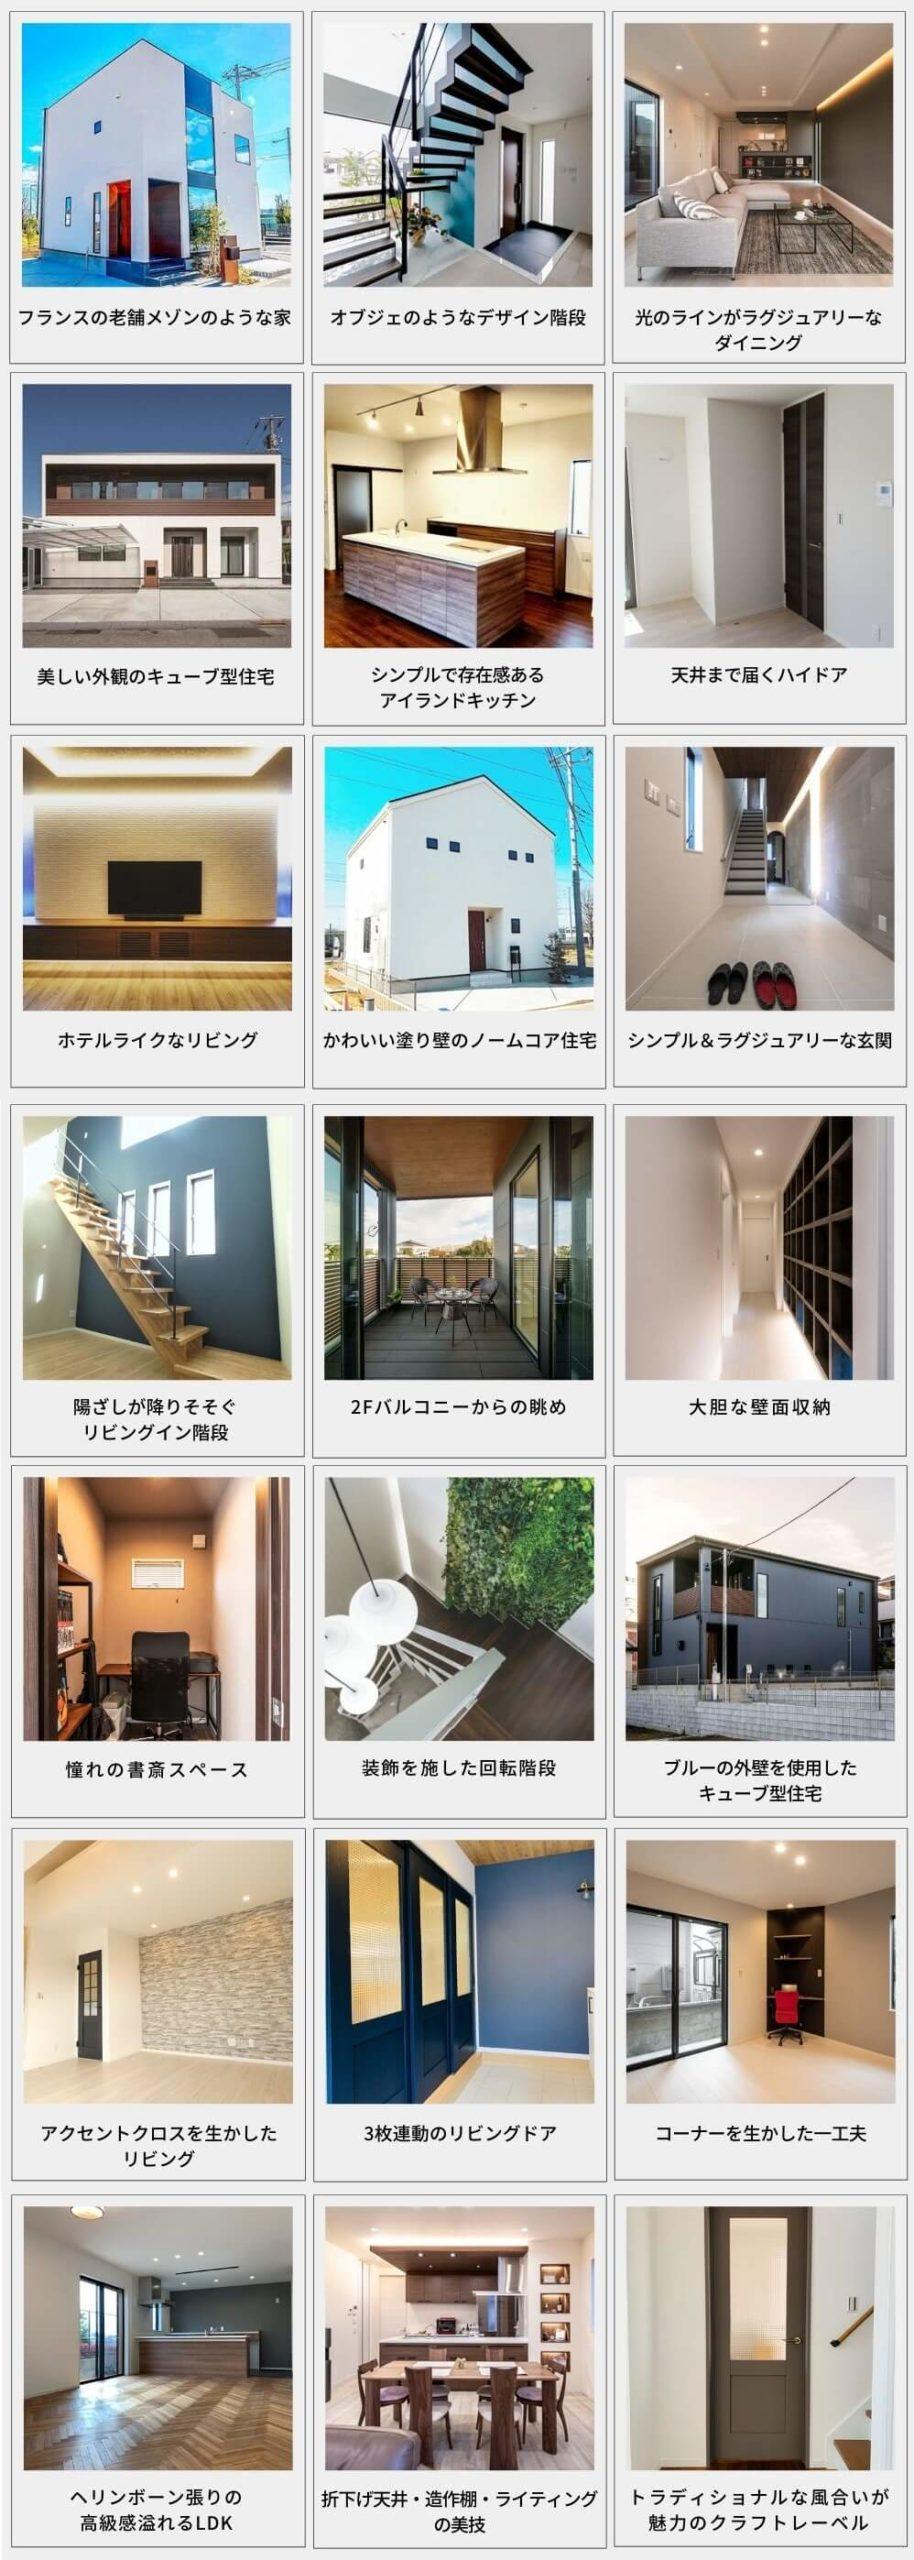 VISIO飯山満Ⅵ│VISIO作品事例